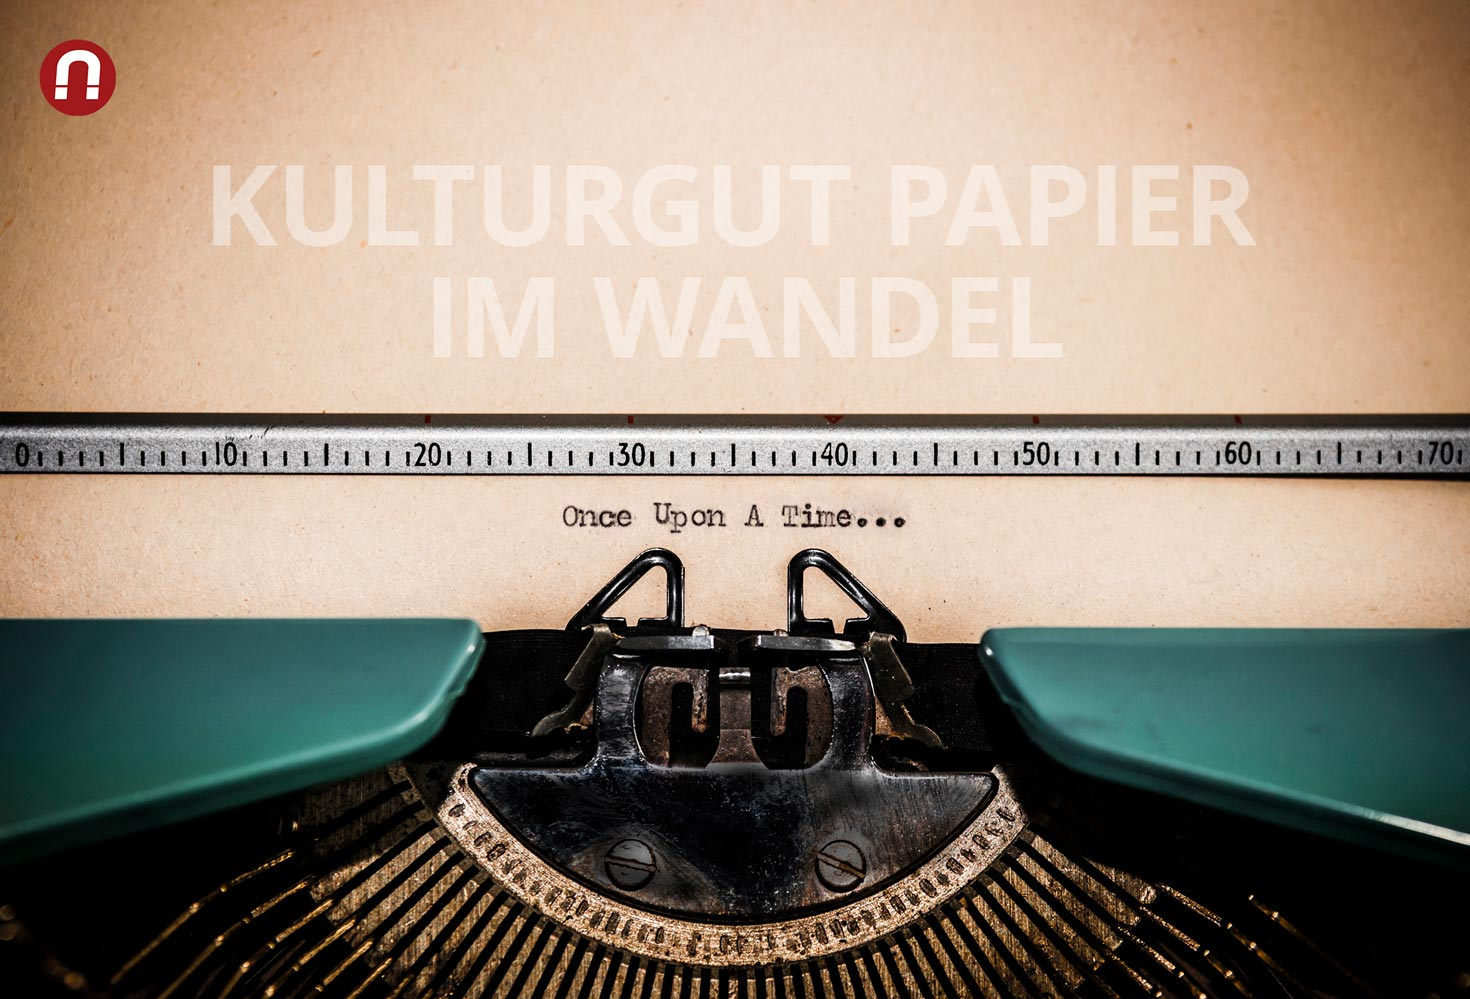 Kulturgut Papier im Wandel